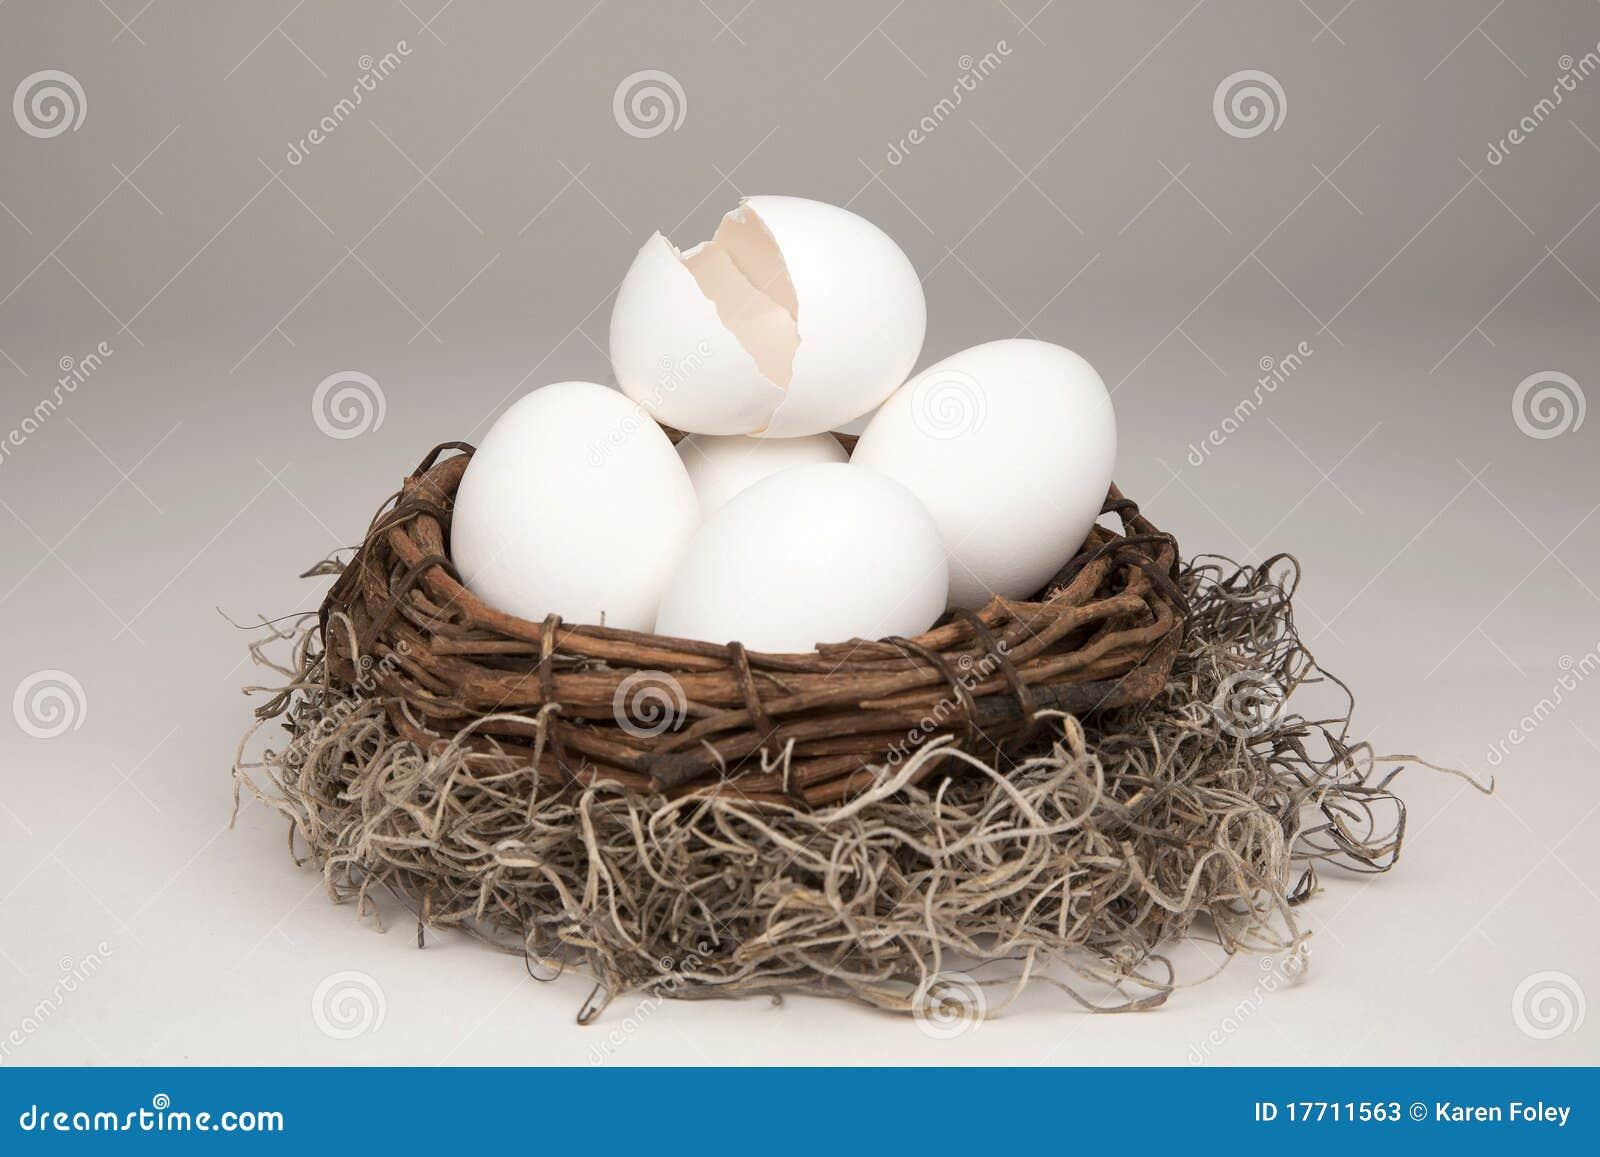 Broken Nest Egg Generic